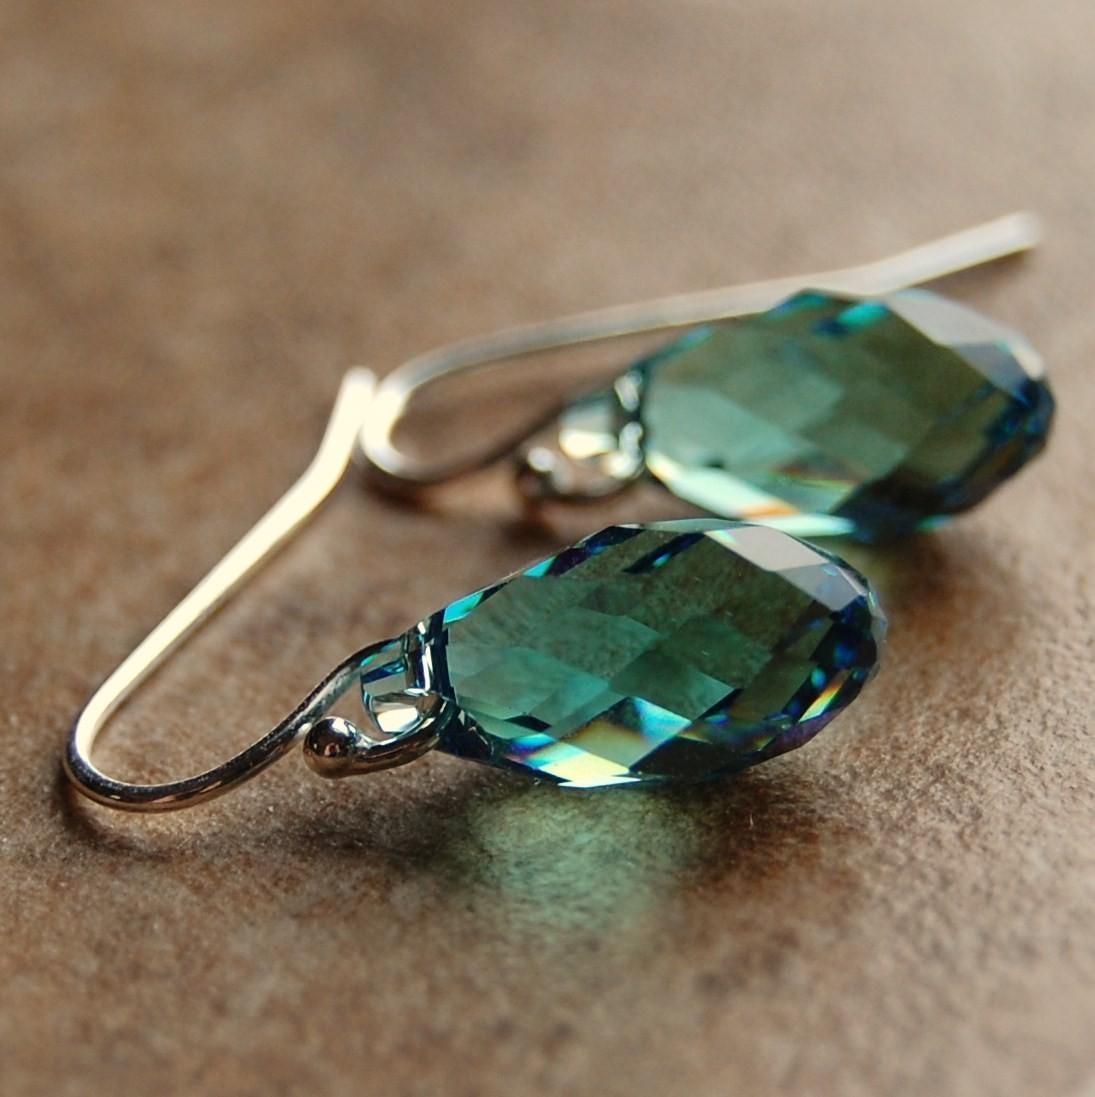 Jewelry, Earrings, Bridal, Bridal jewelry, Crystals, Dangle, Fancy, Wedding jewelry, Bridesmaid jewelry, Ohio, South paw studios, Katy mims, Toledo